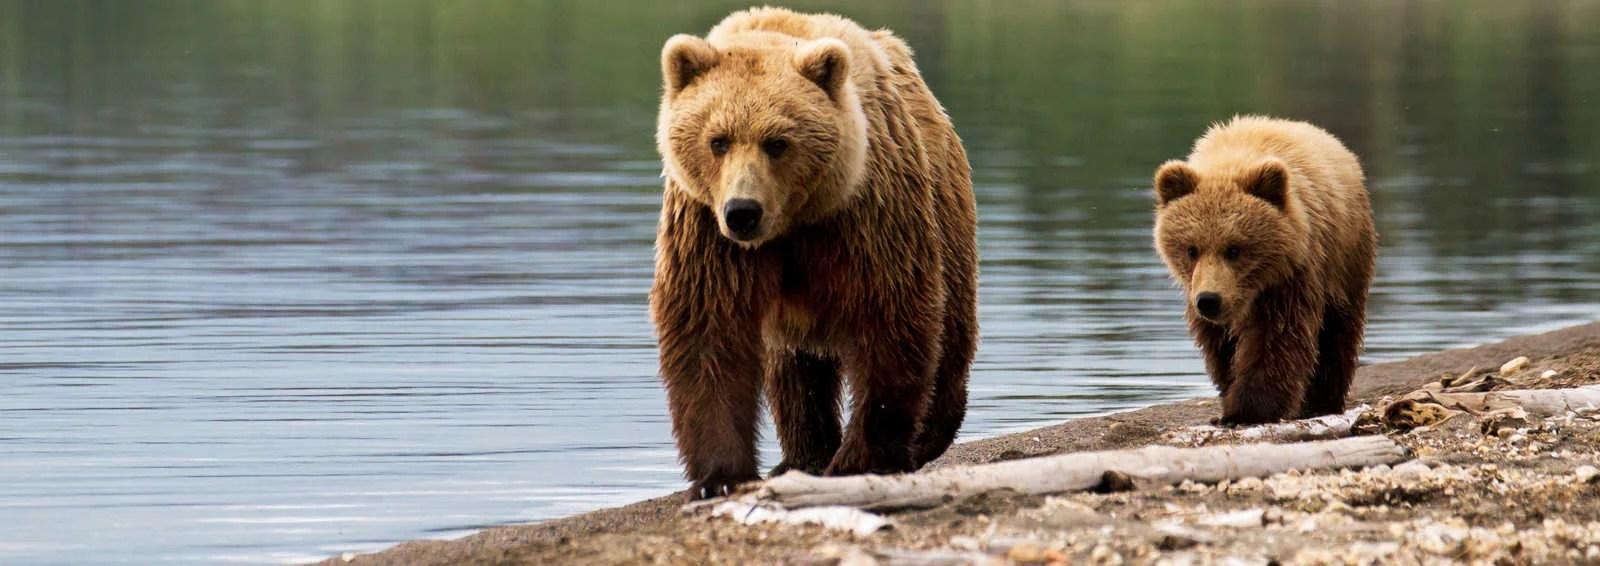 bear watching holidays wildlife